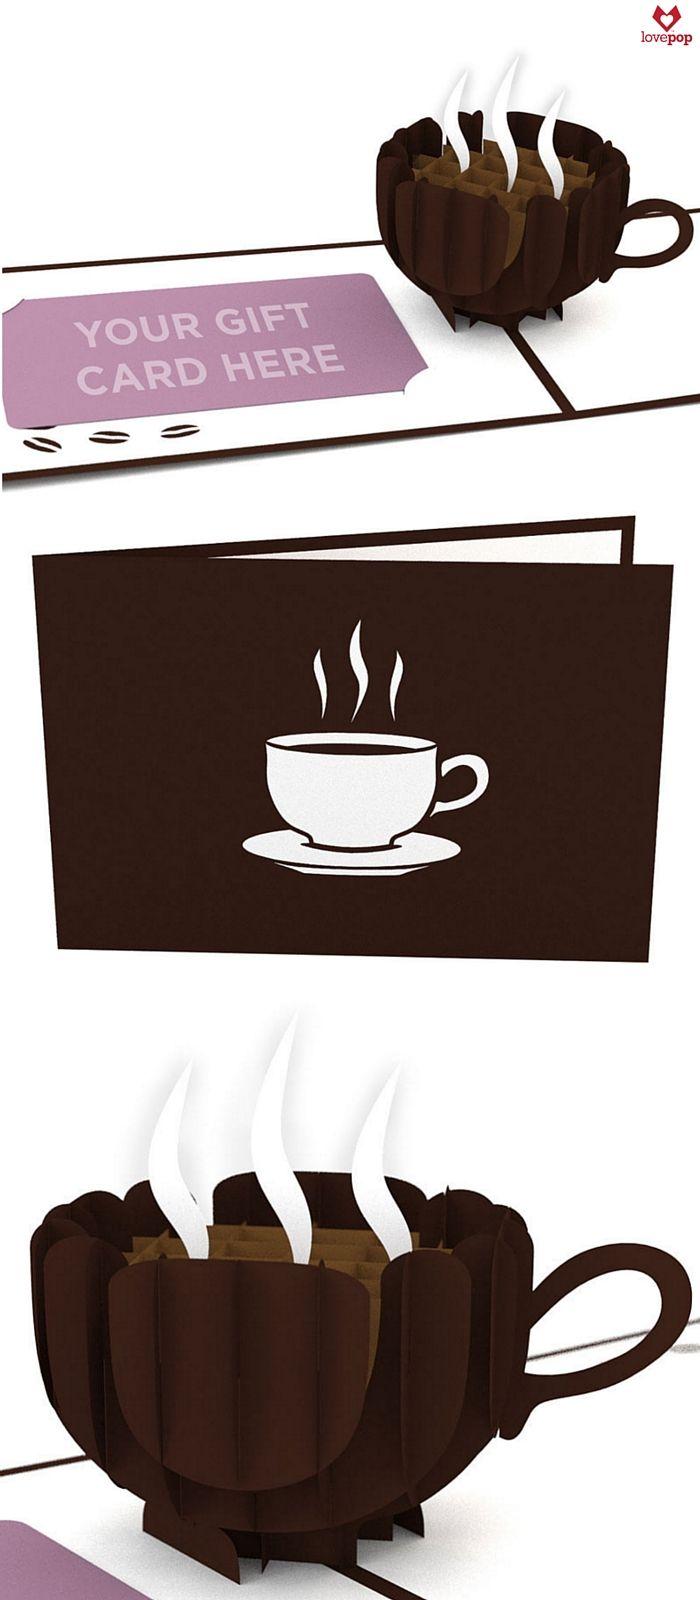 440 Best 3d Pop Up Cards Images On Pinterest 3d Cards Pop Up